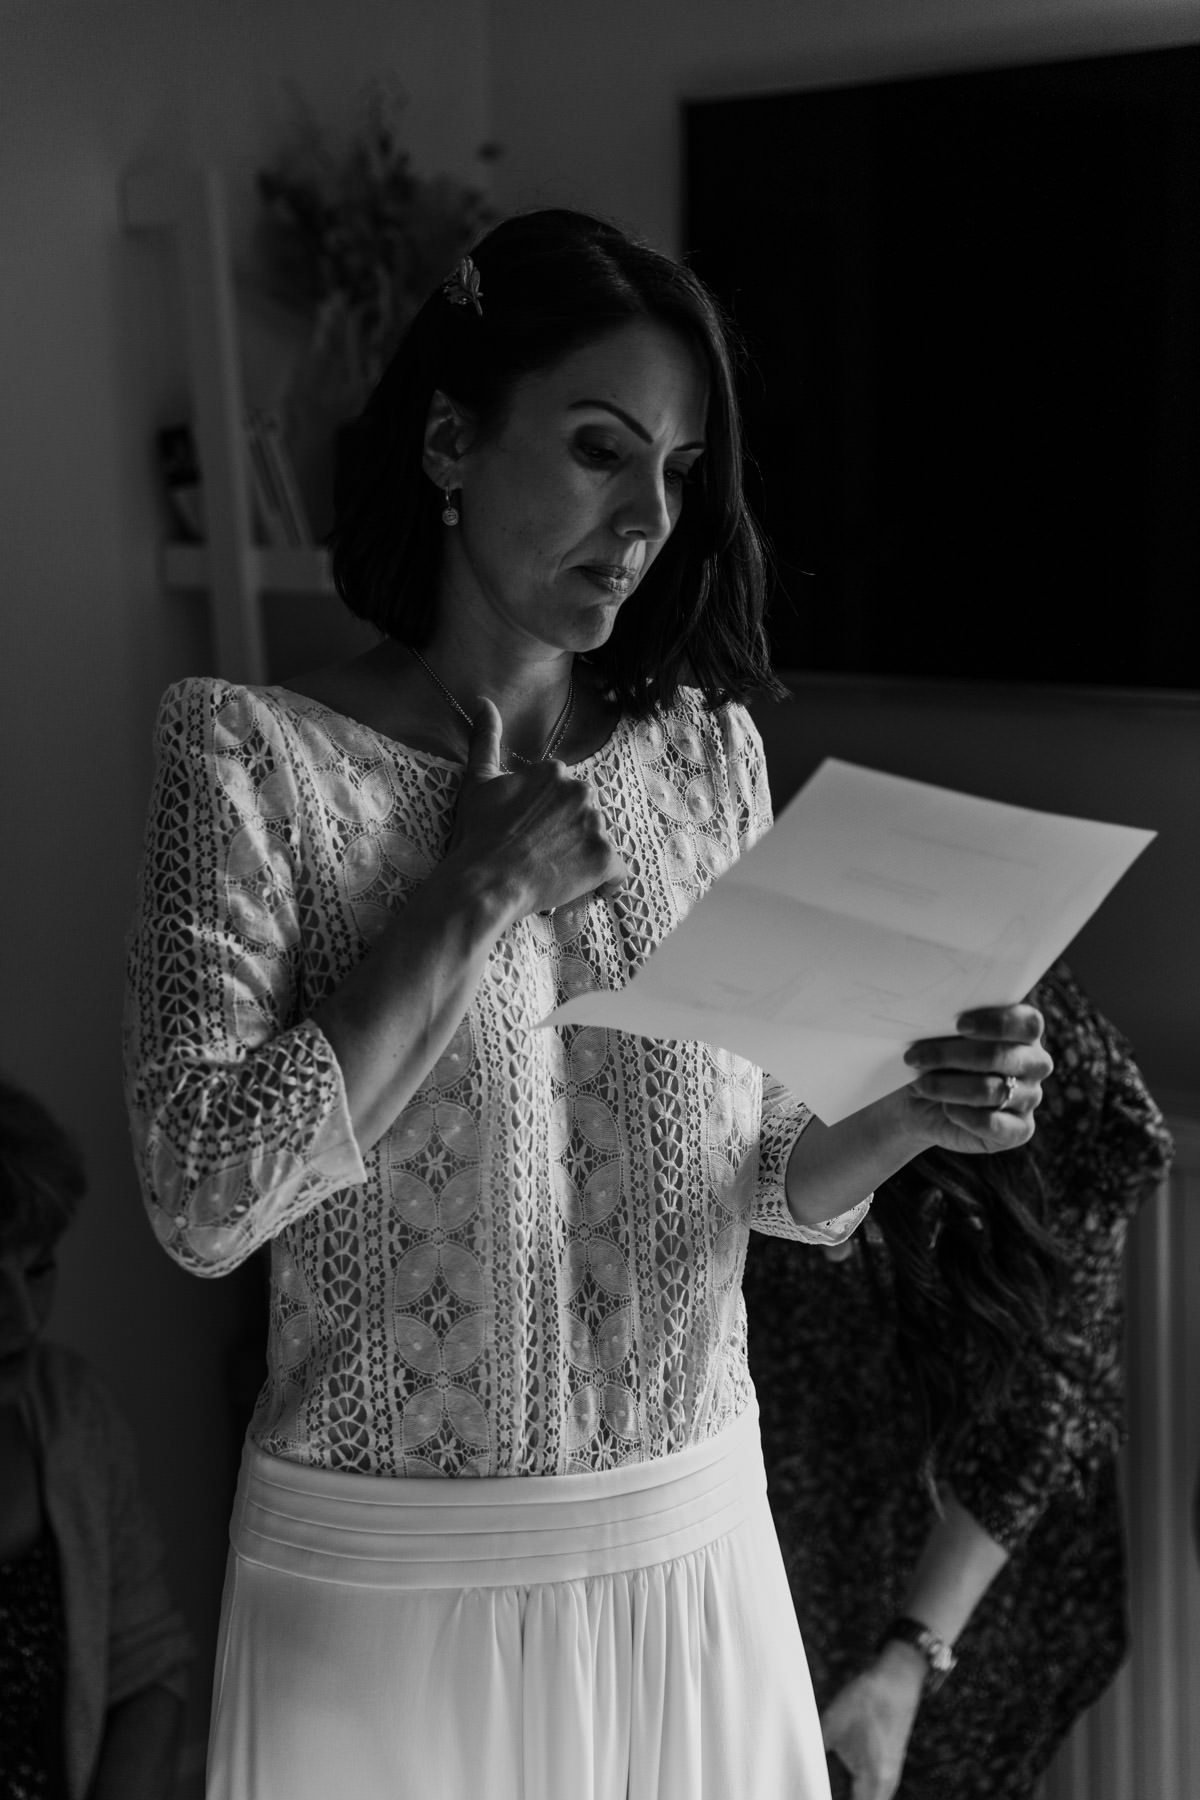 preparatifs mariage lecture des voeux mariee dentelle robe blanche